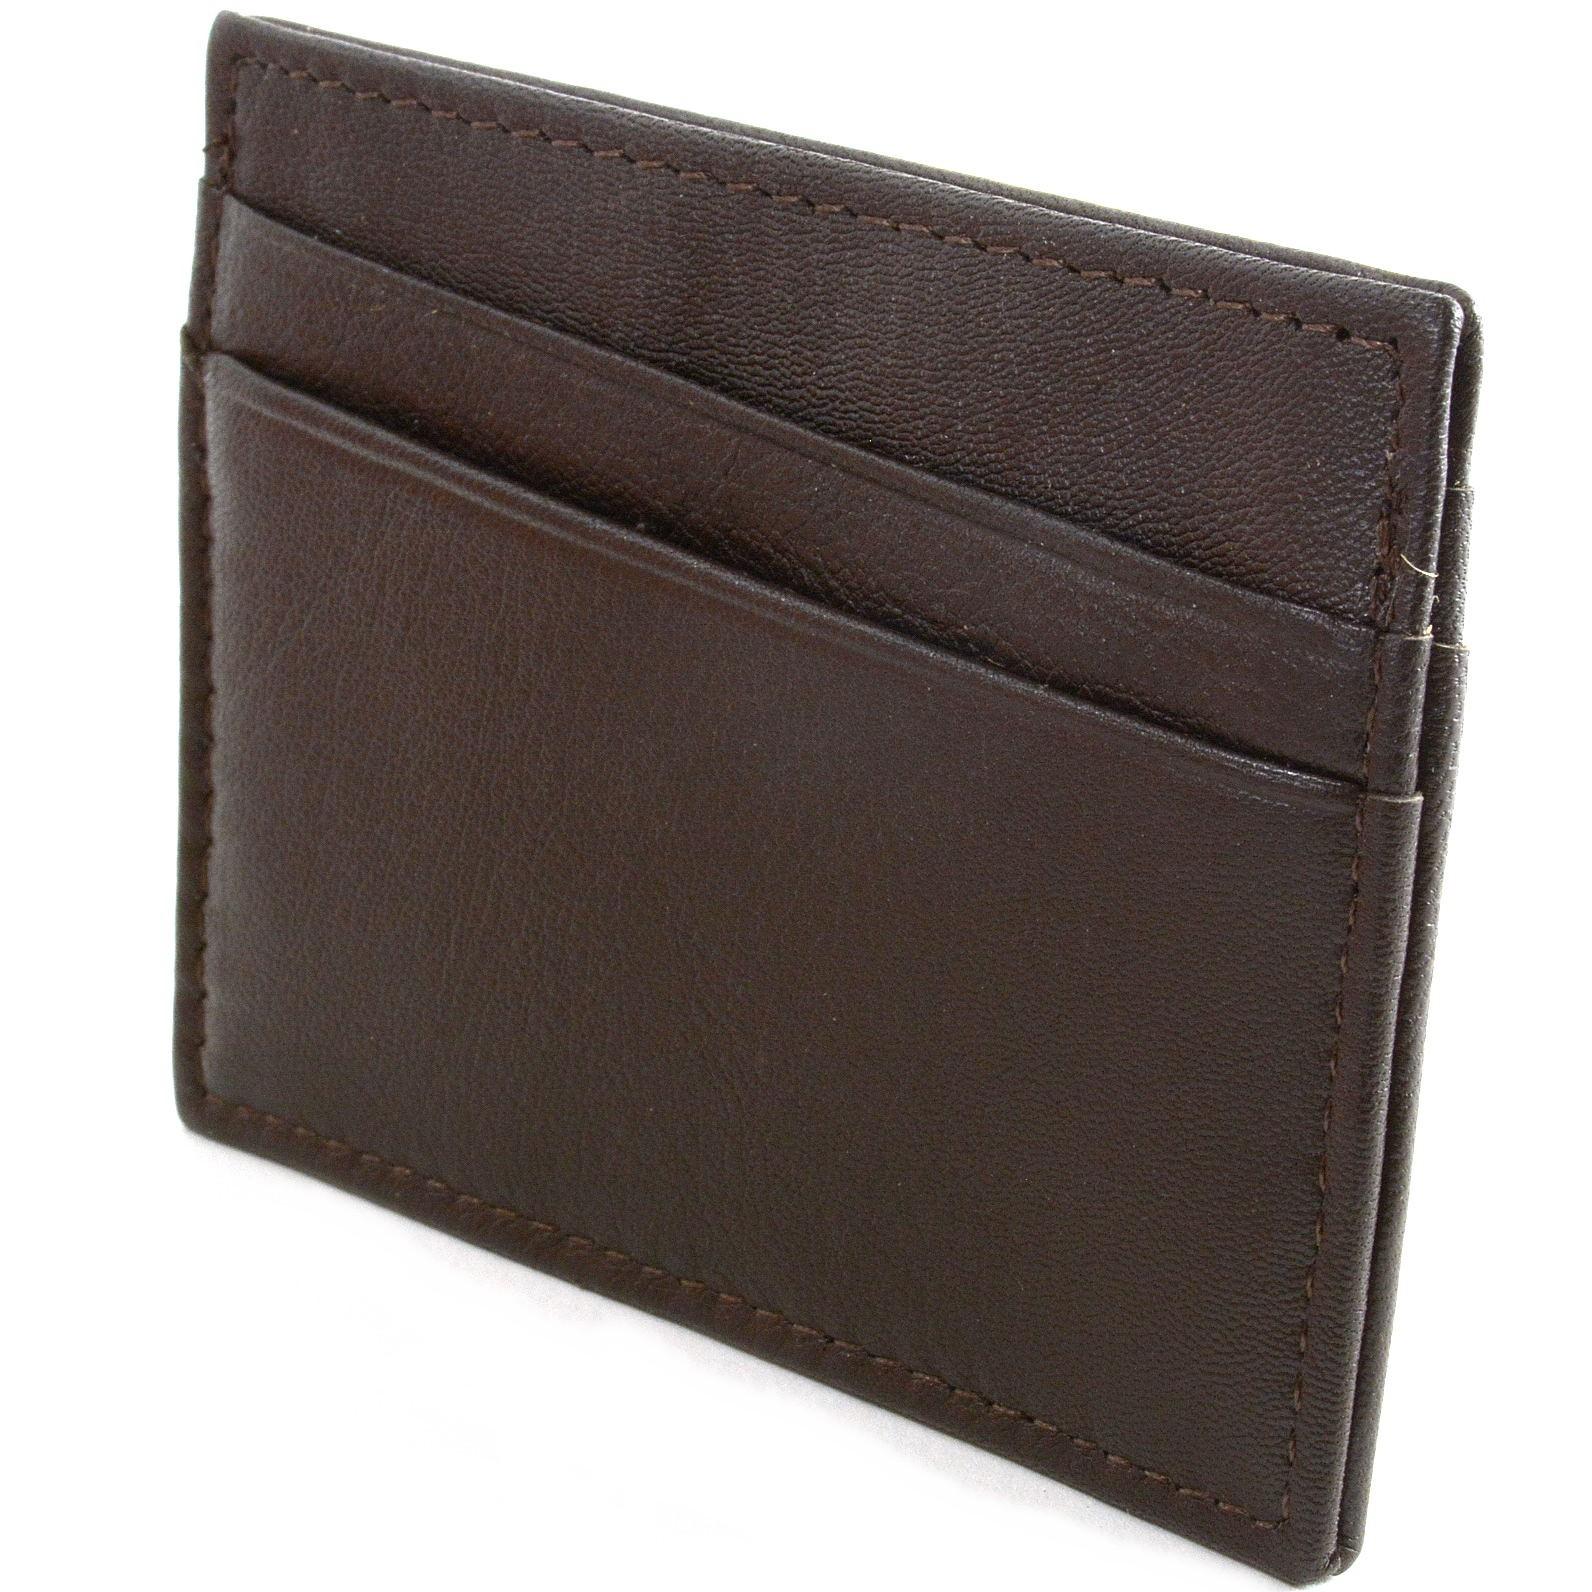 Alpine-Swiss-Minimalist-Leather-Front-Pocket-Wallet-5-Card-Slots-Slim-Thin-Case thumbnail 51